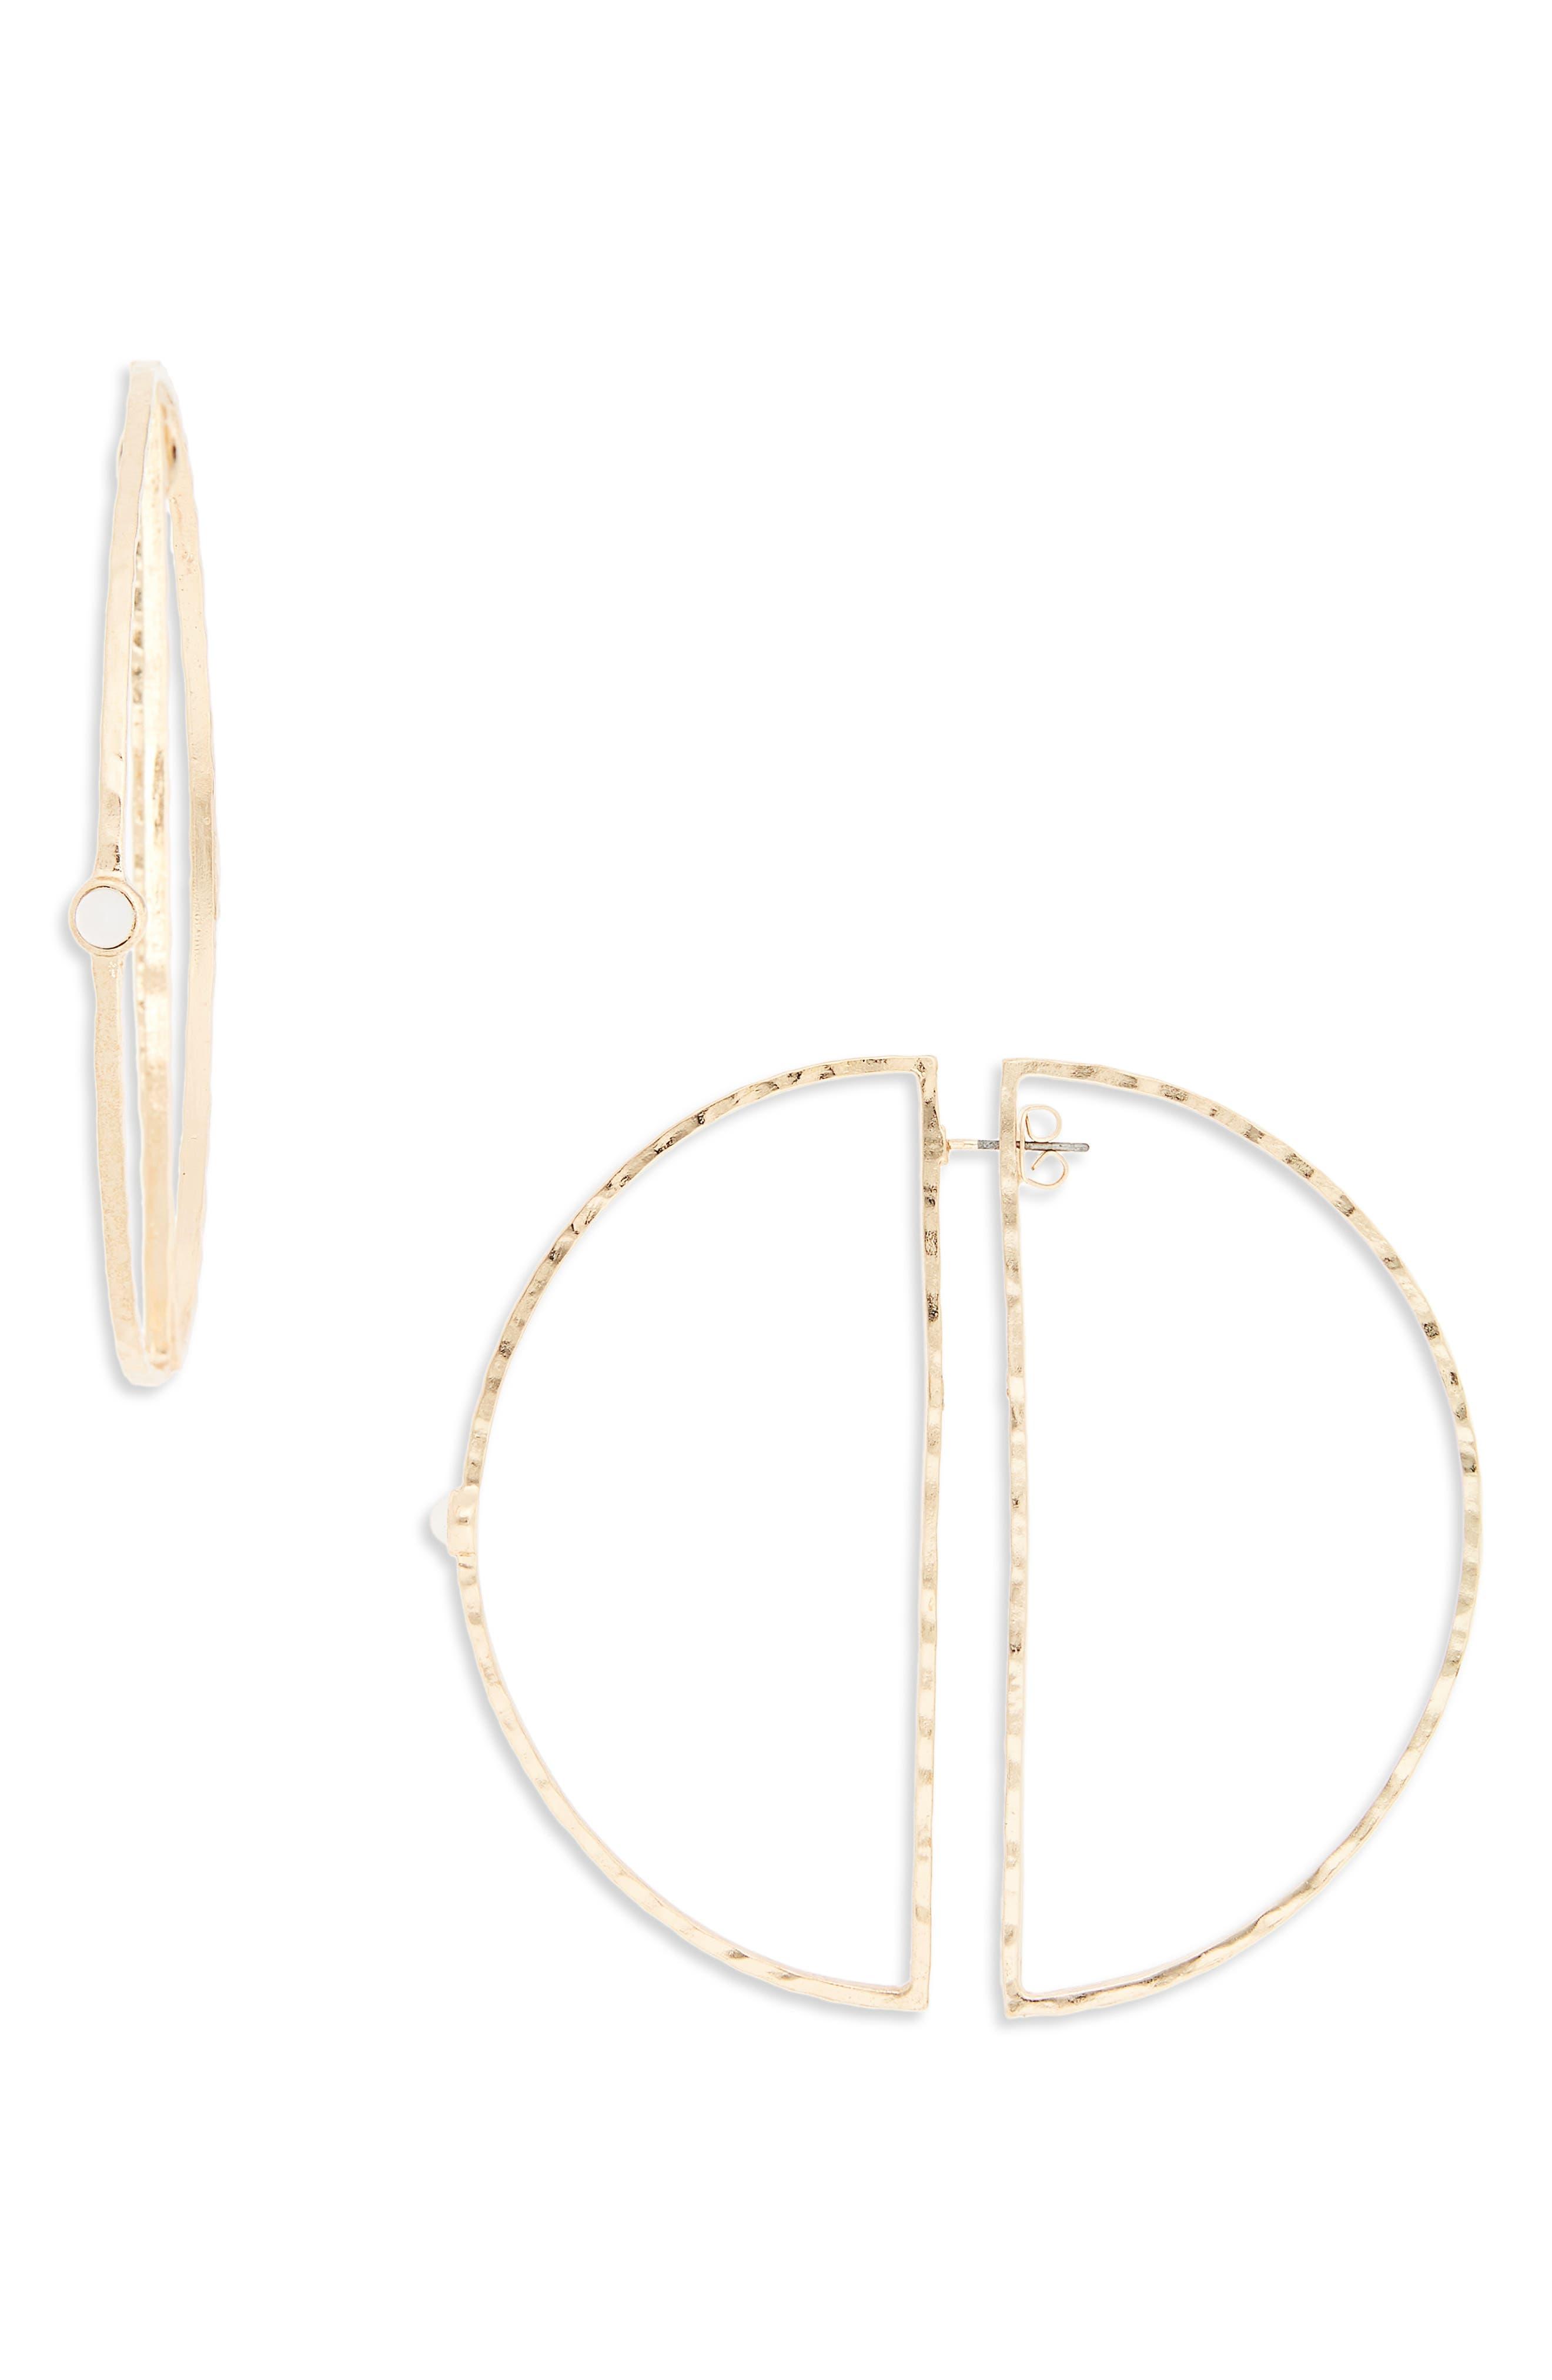 Imitation Pearl Hoop Ear Jackets,                         Main,                         color, Gold/ White